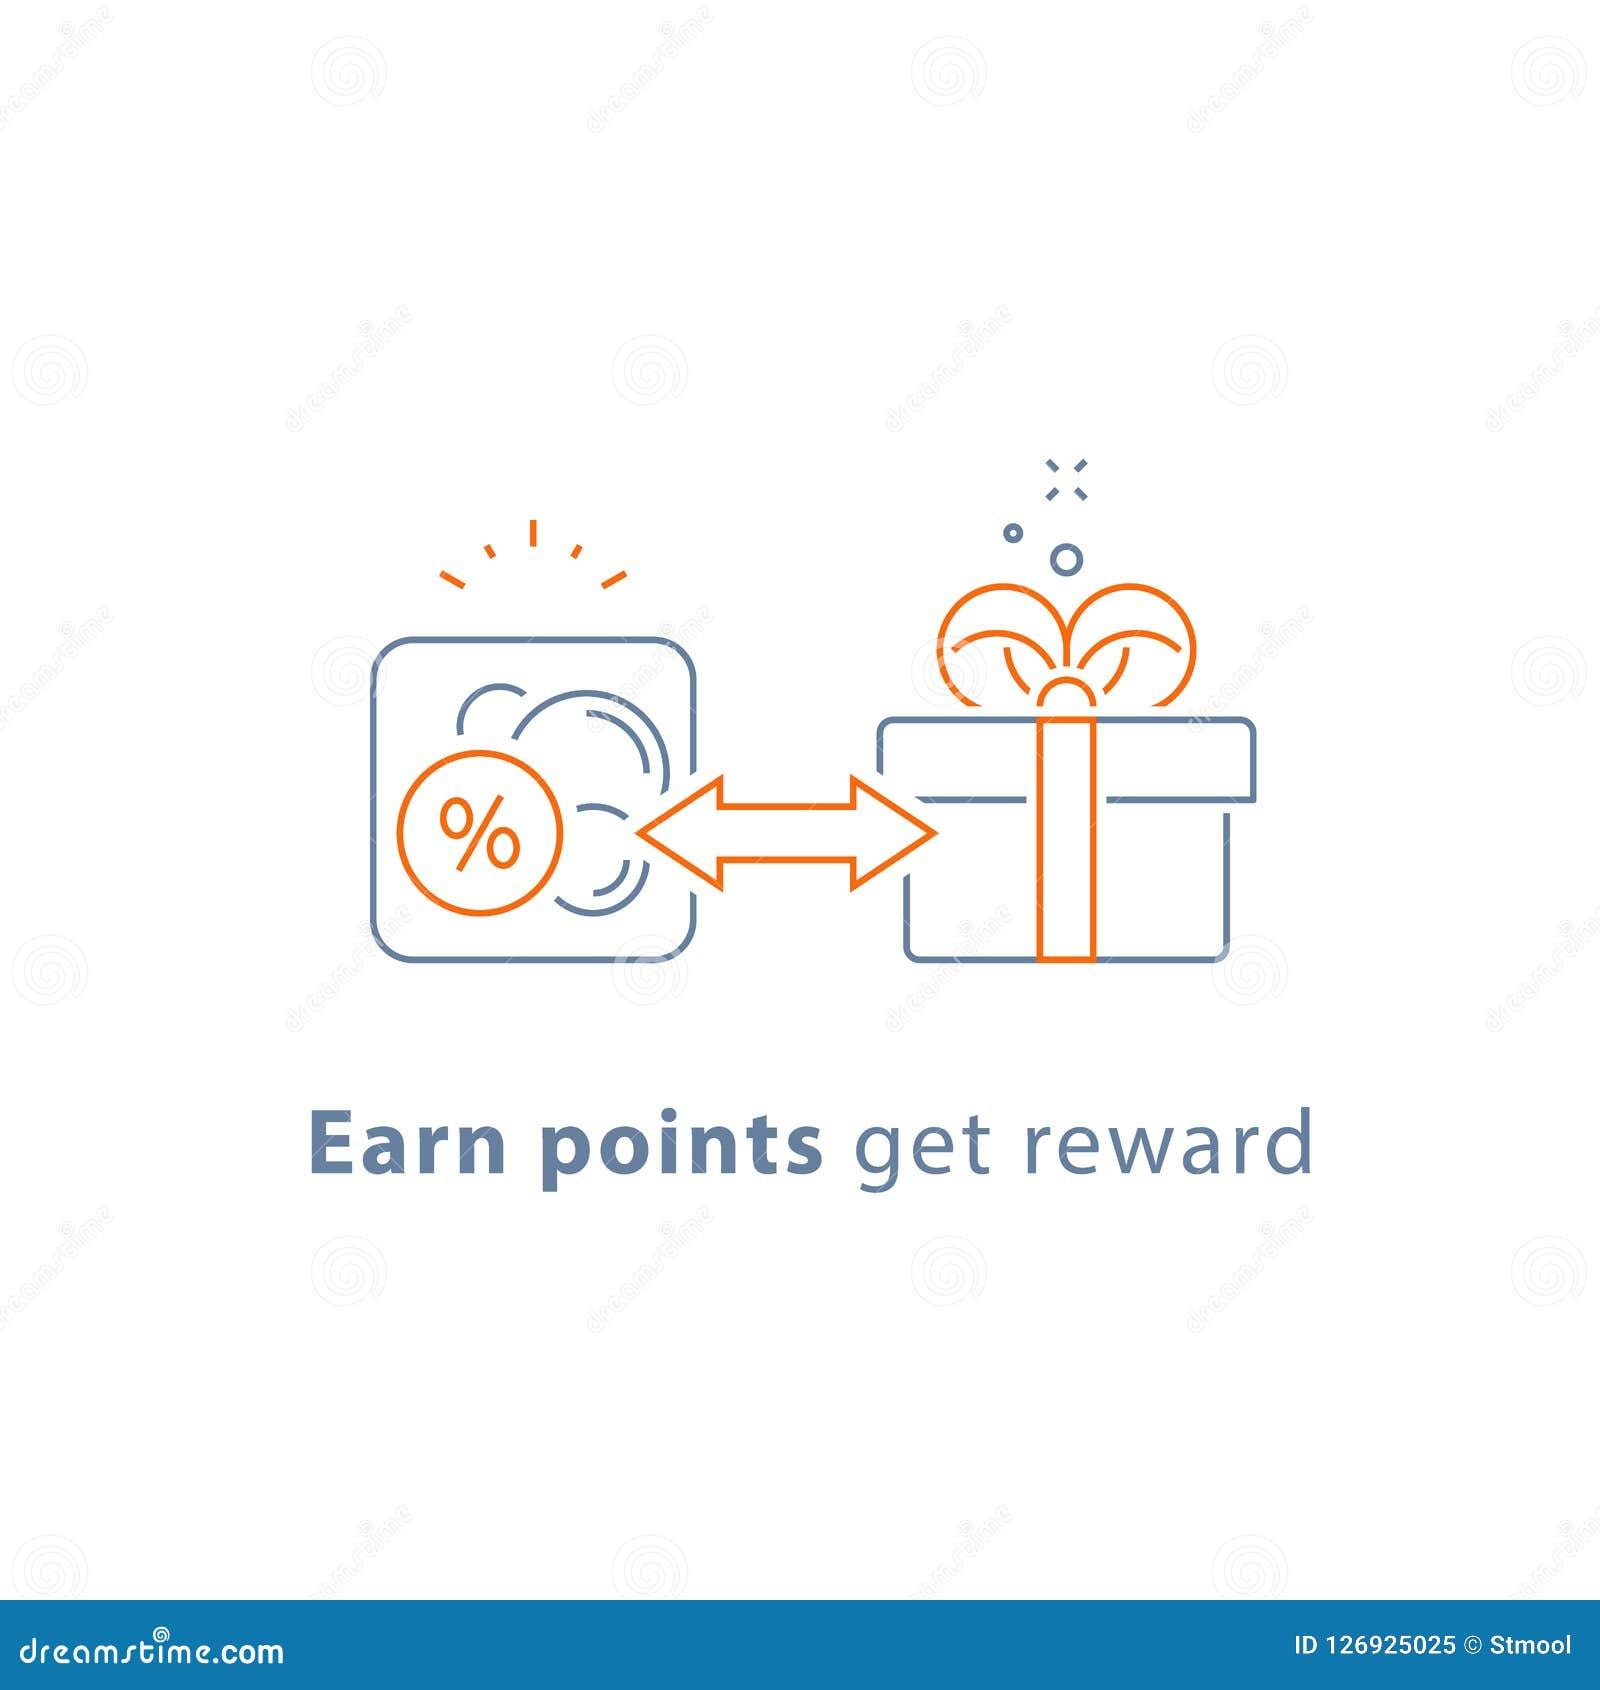 Loyalty Rewards Program >> Loyalty Program Earn Points And Get Reward Marketing